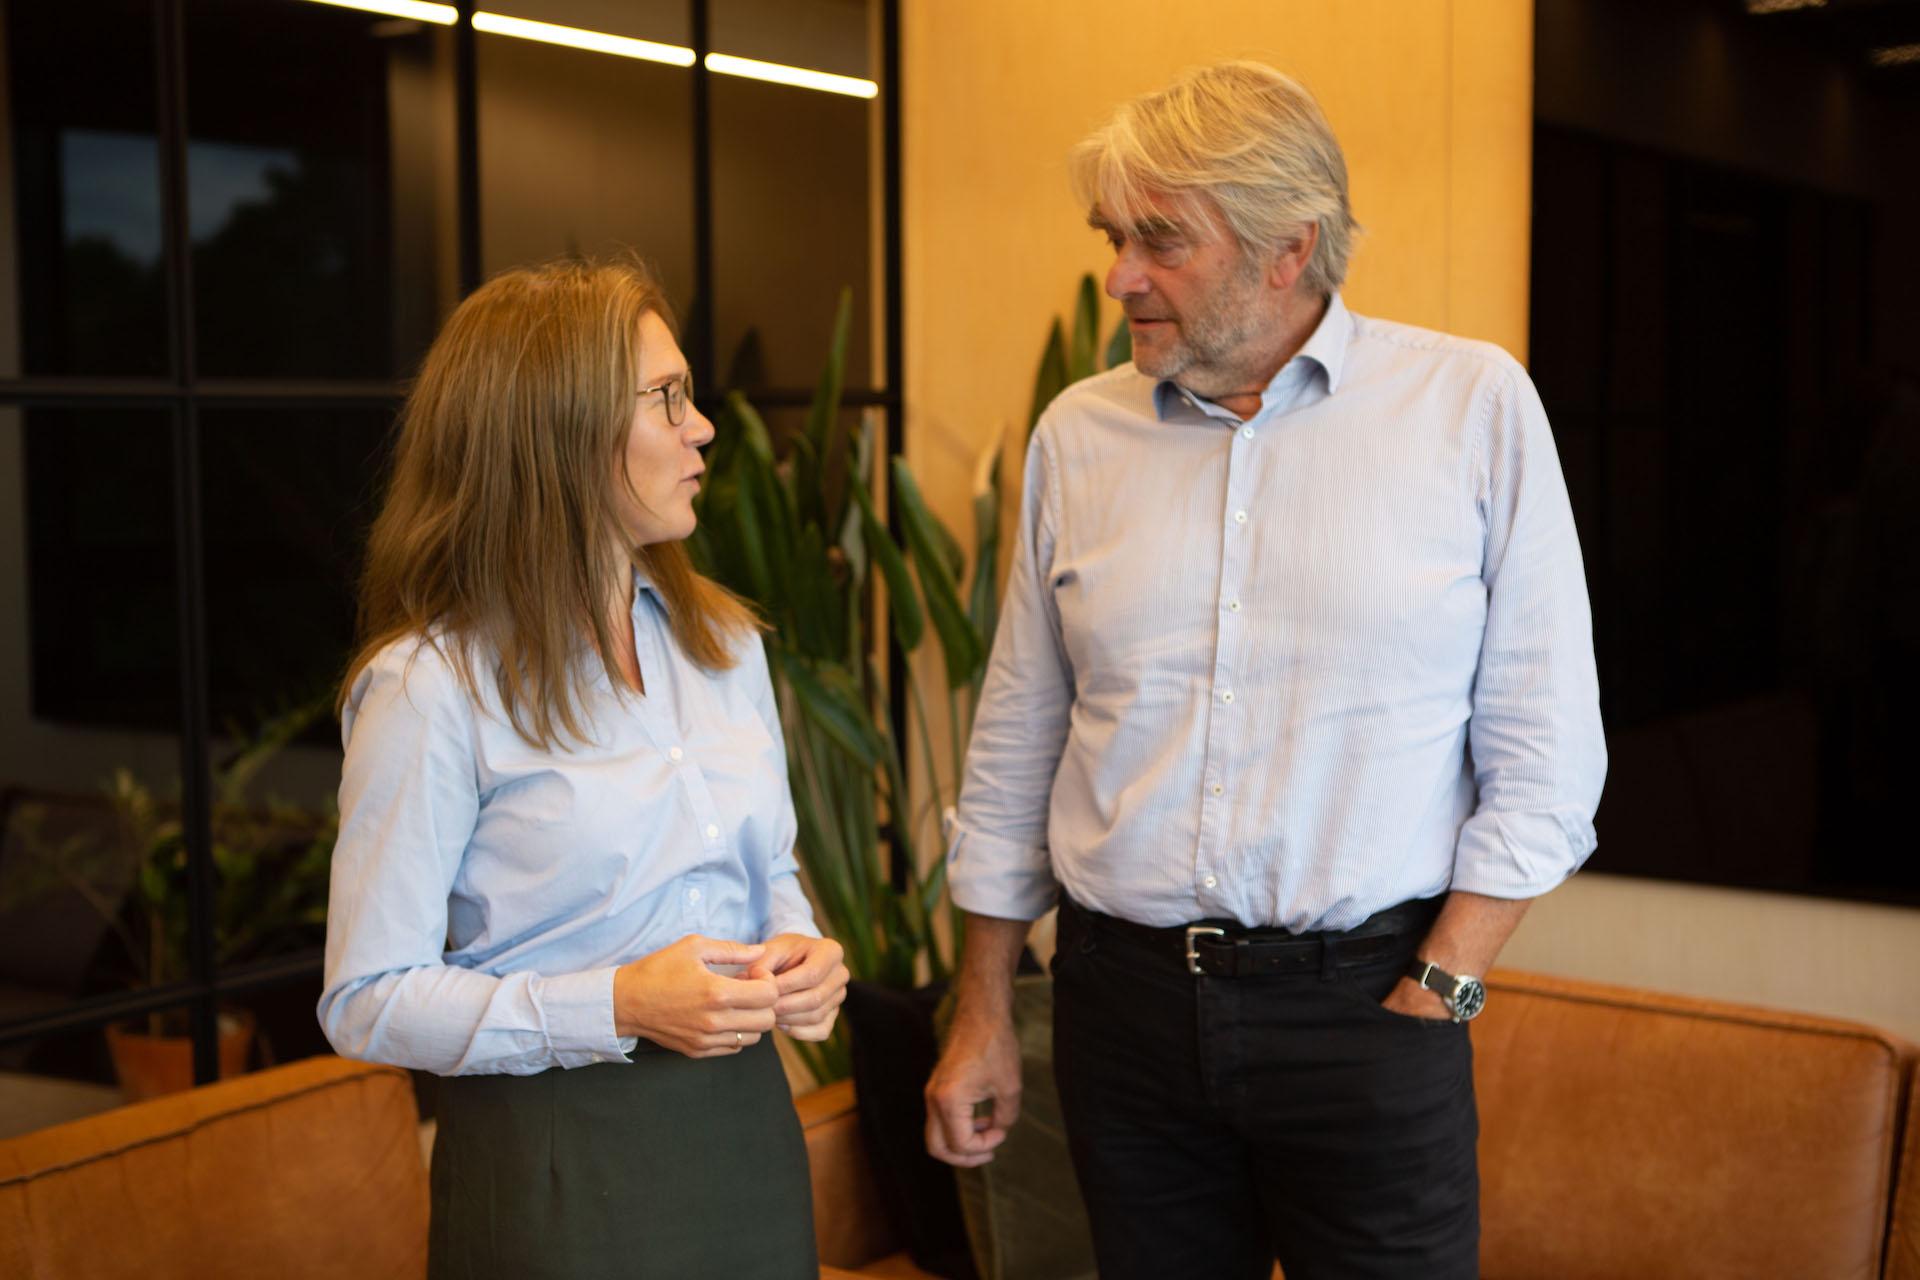 Ola Mestad gjest i ny podkast-episode om grunnlov, vev og prydsøm